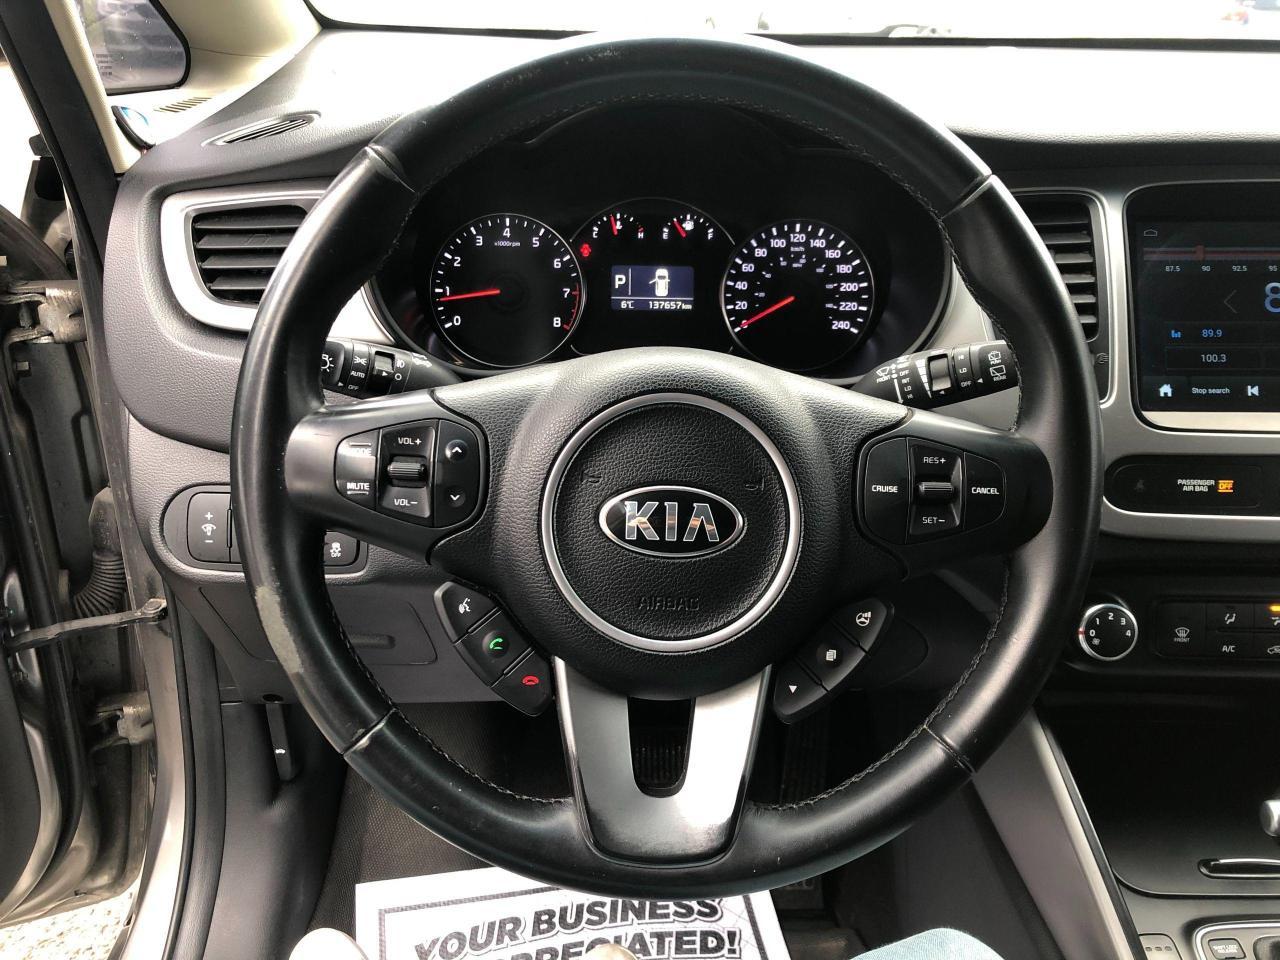 2016 Kia Rondo